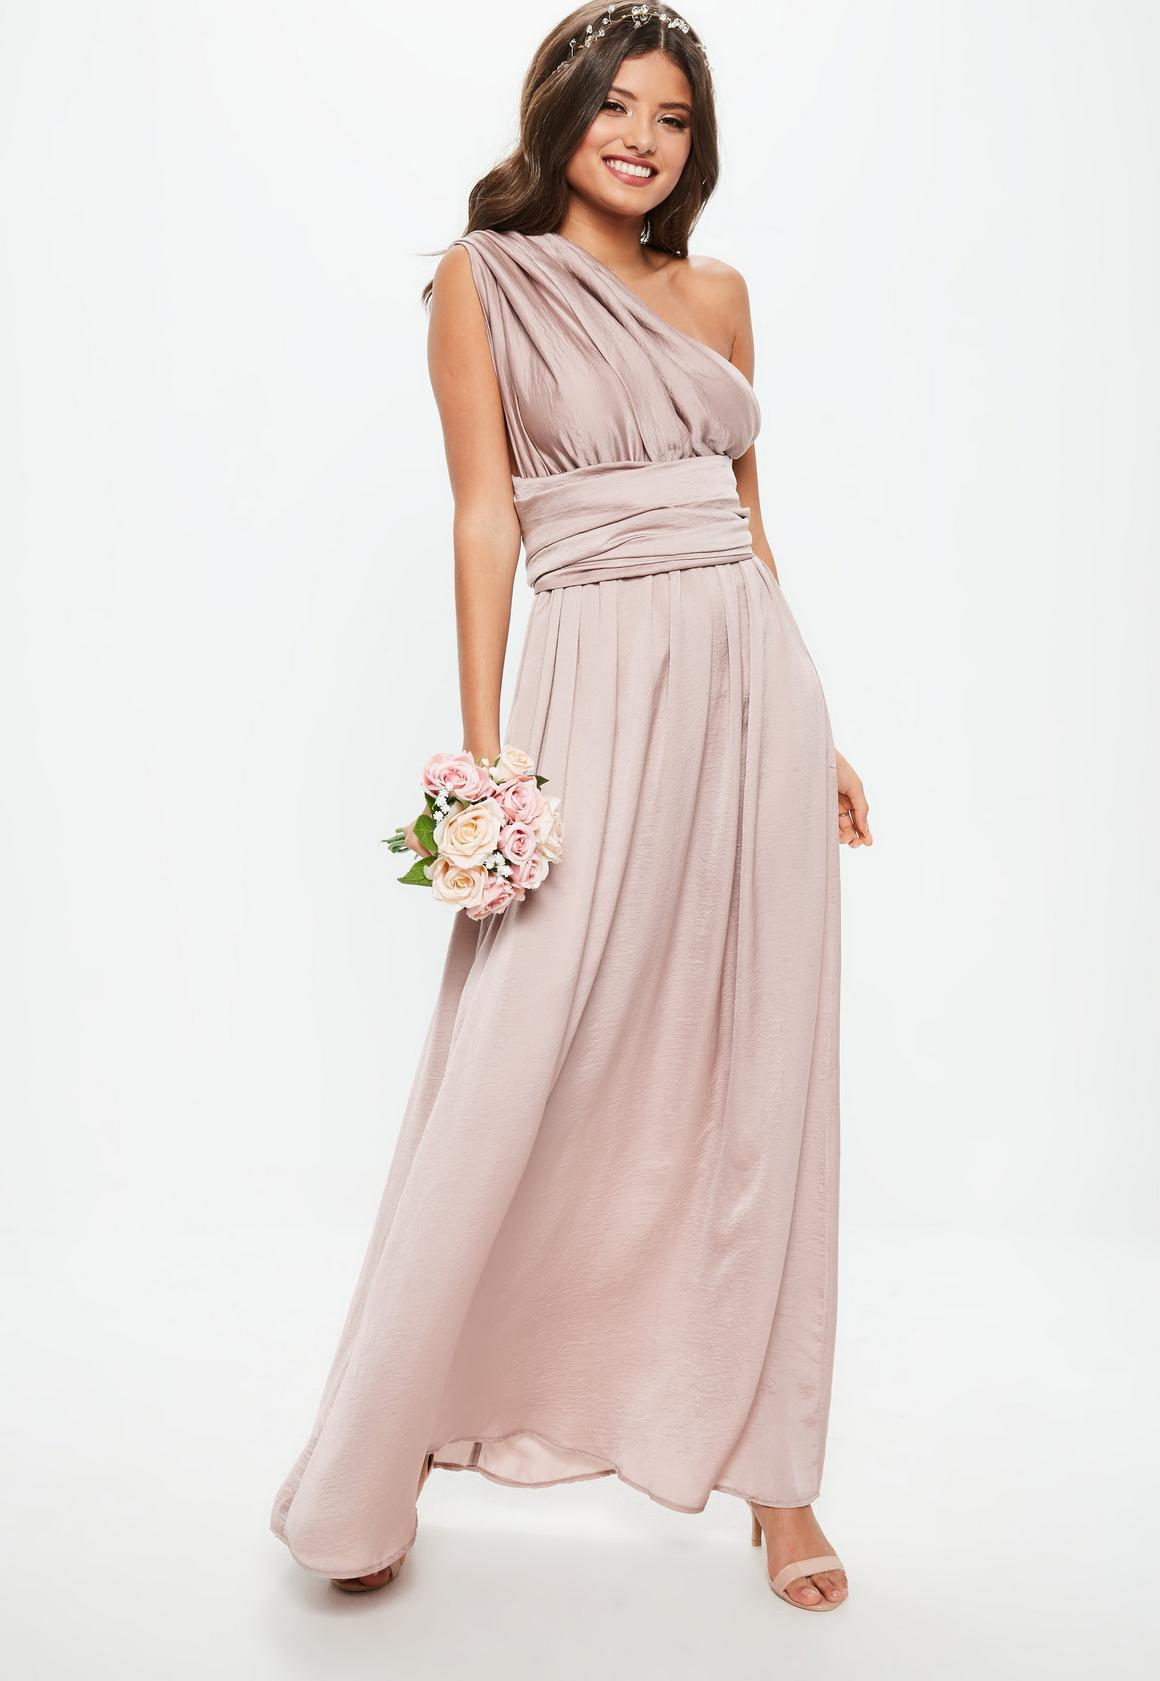 Robe de soiree pour la mariee